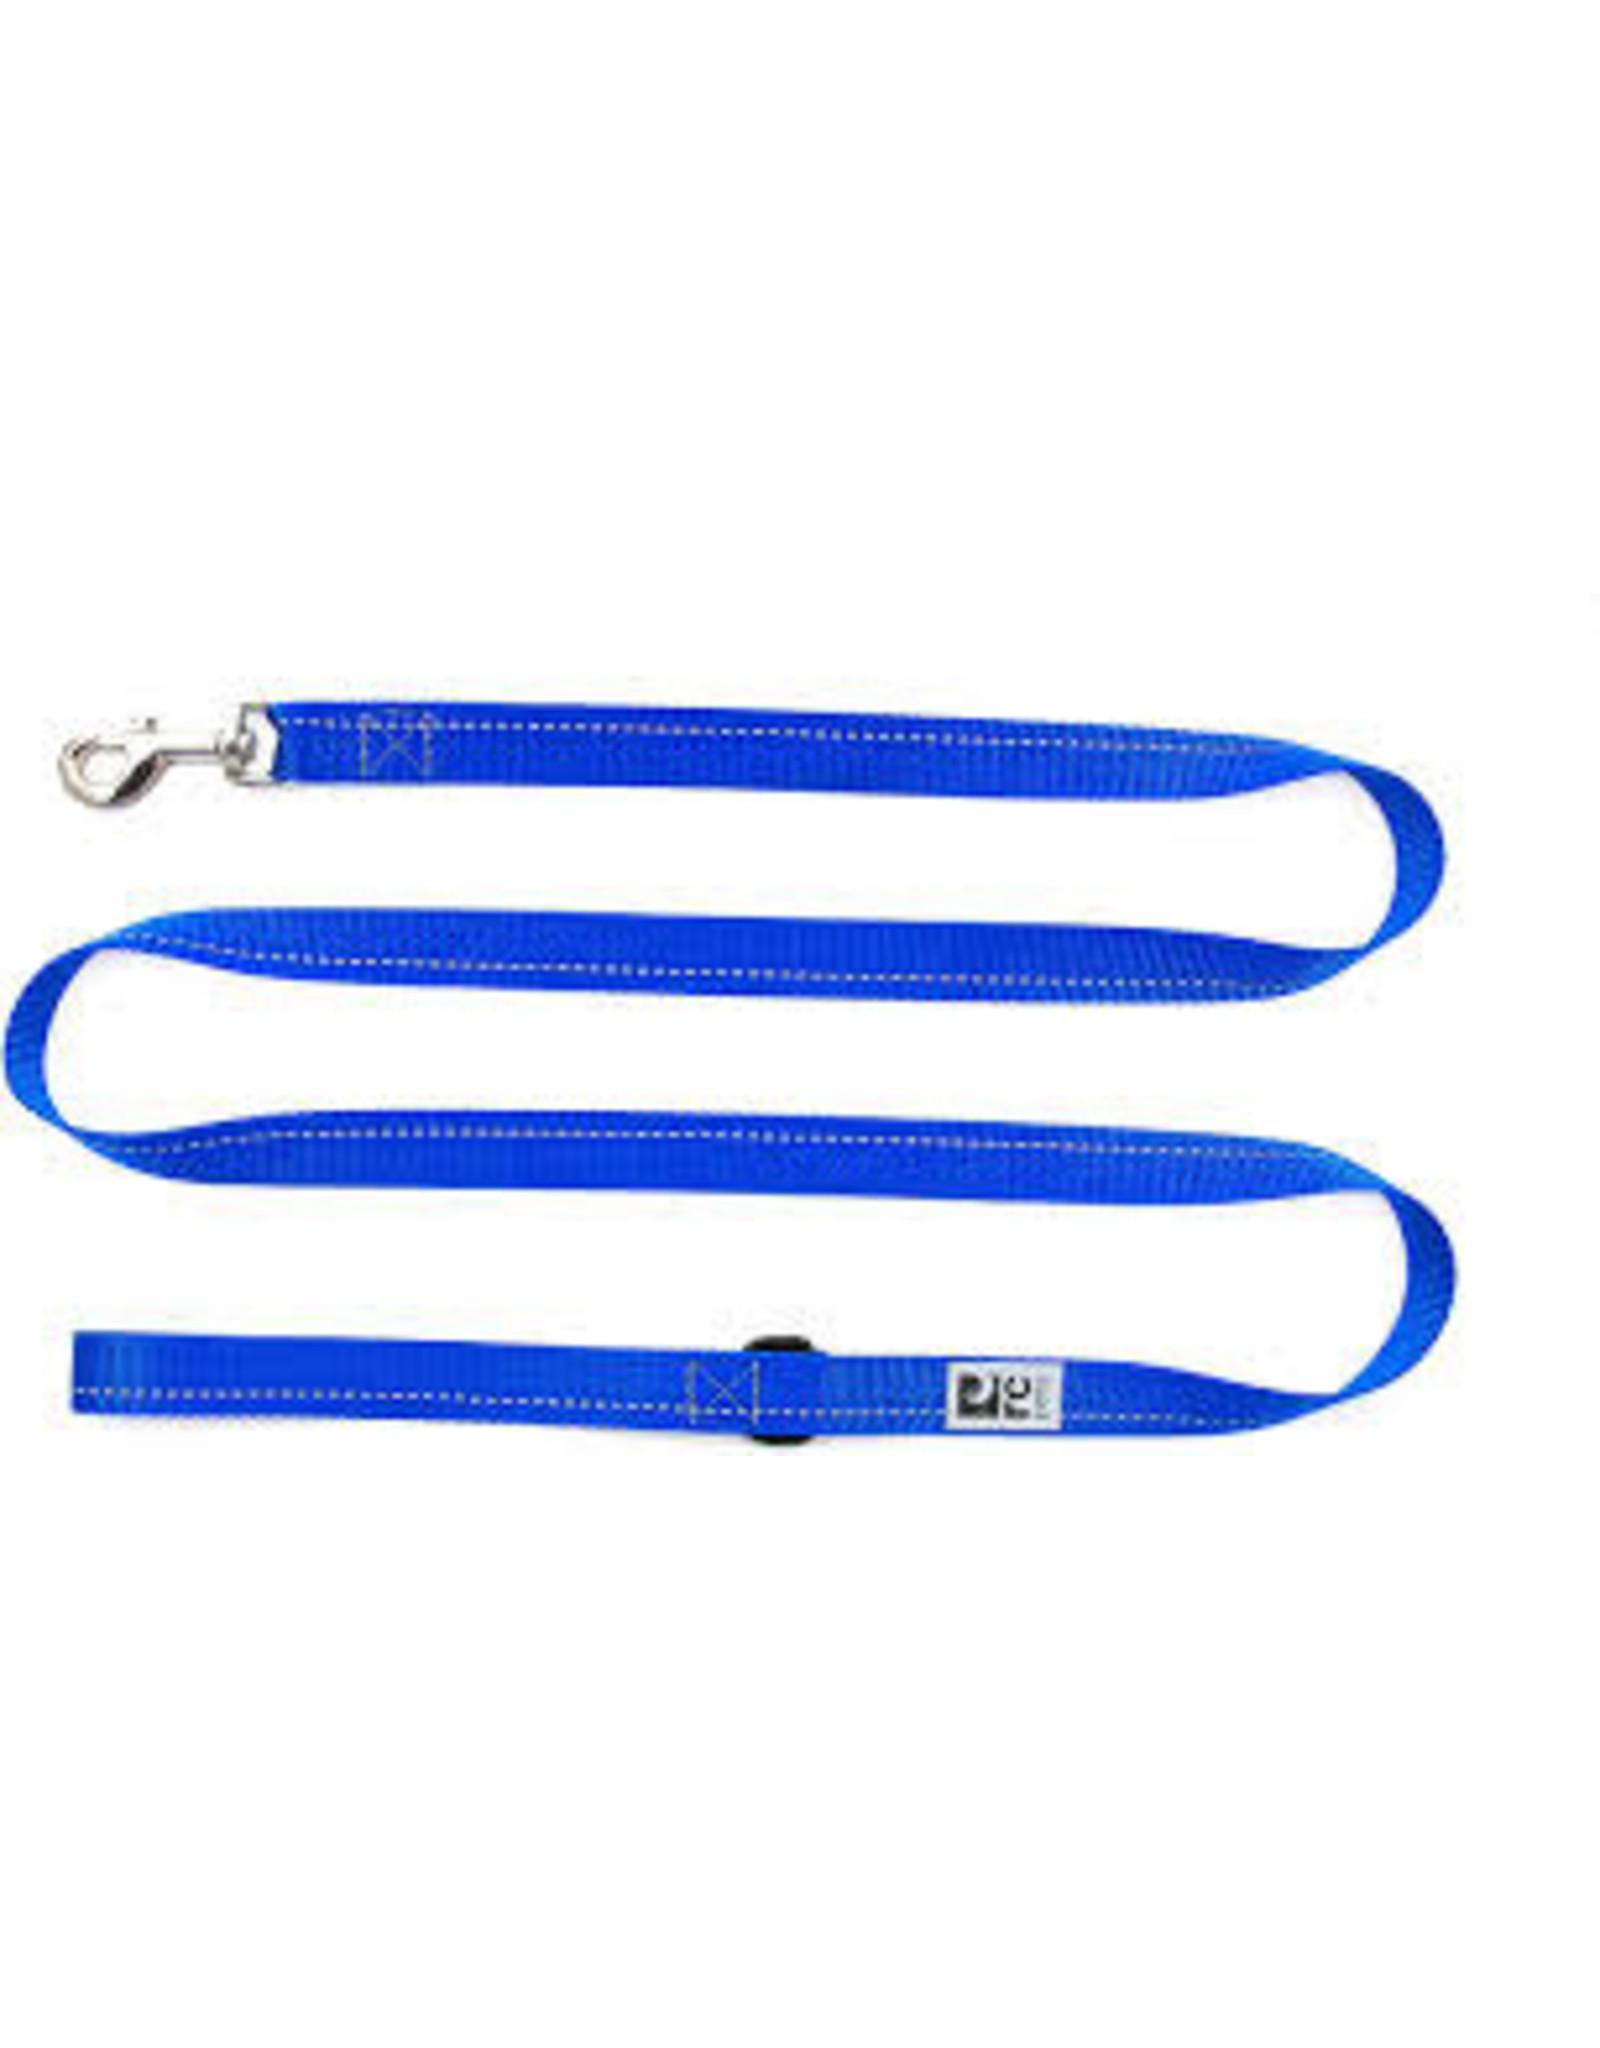 RC Pets Primary Dog Leash